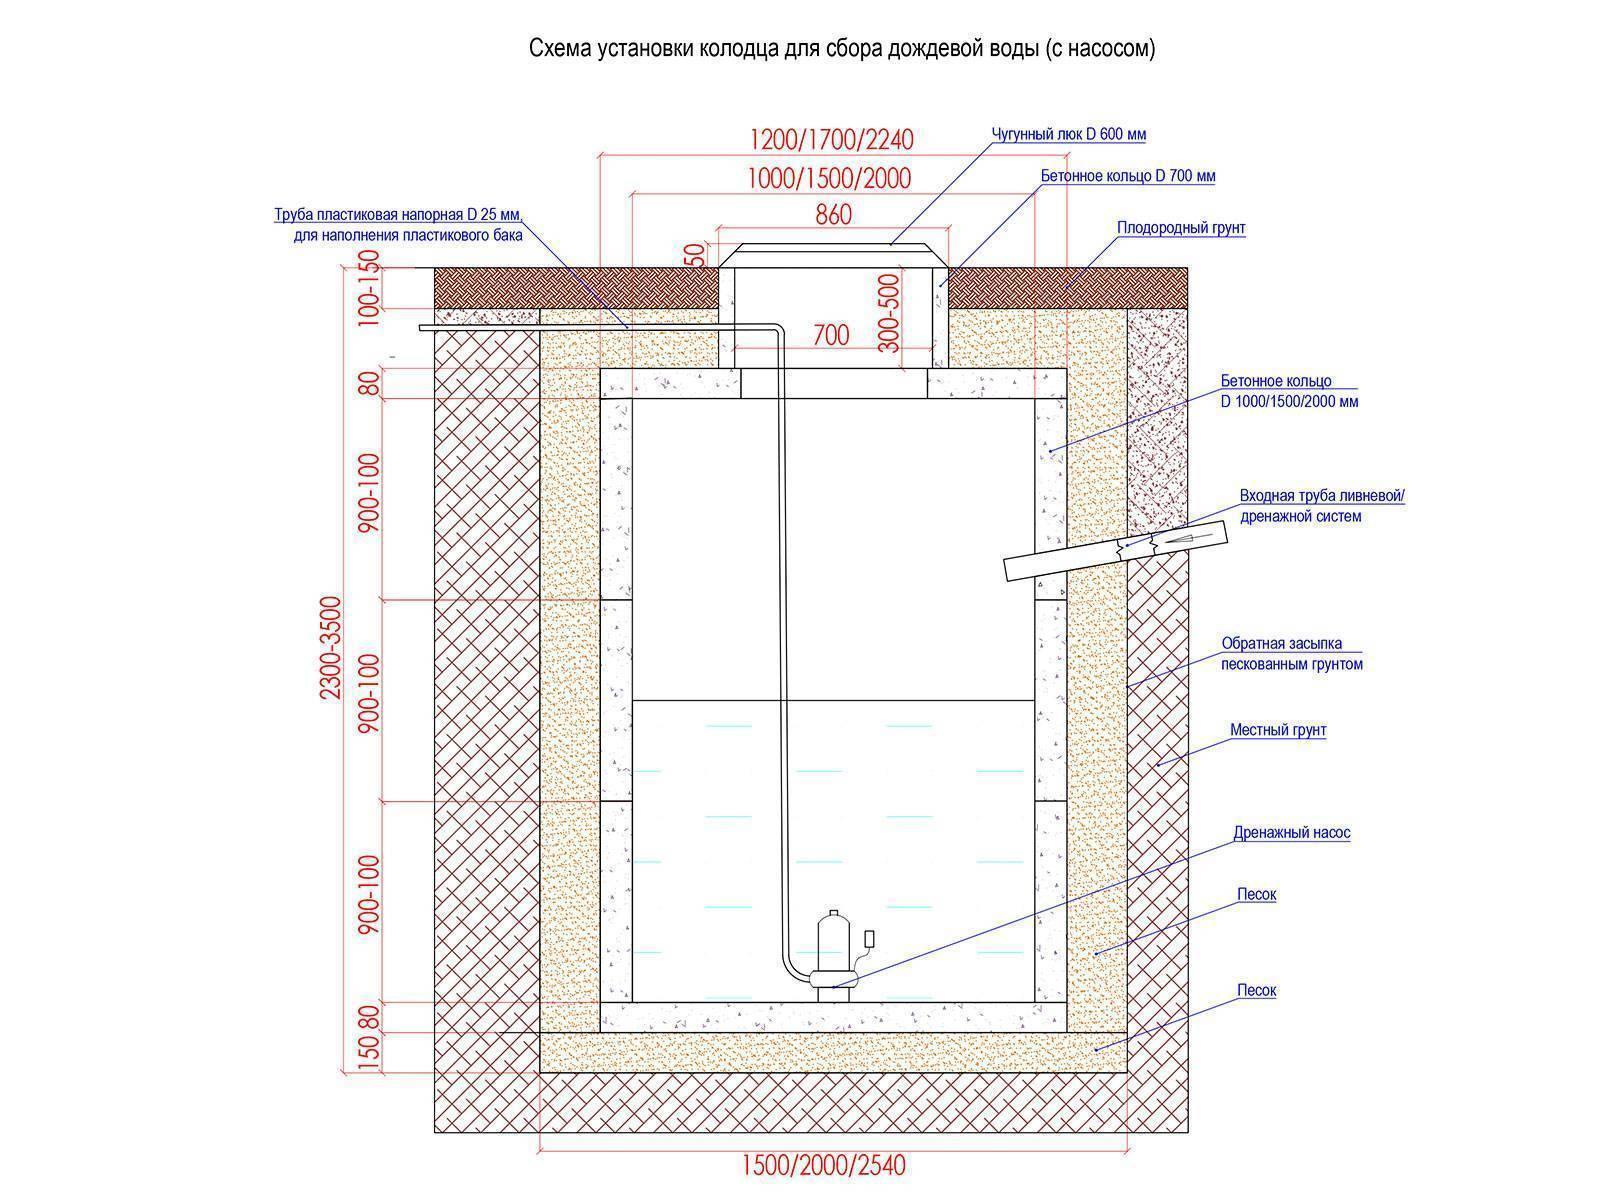 Дренажный колодец: разновидности, характеристики, функции   гидро гуру